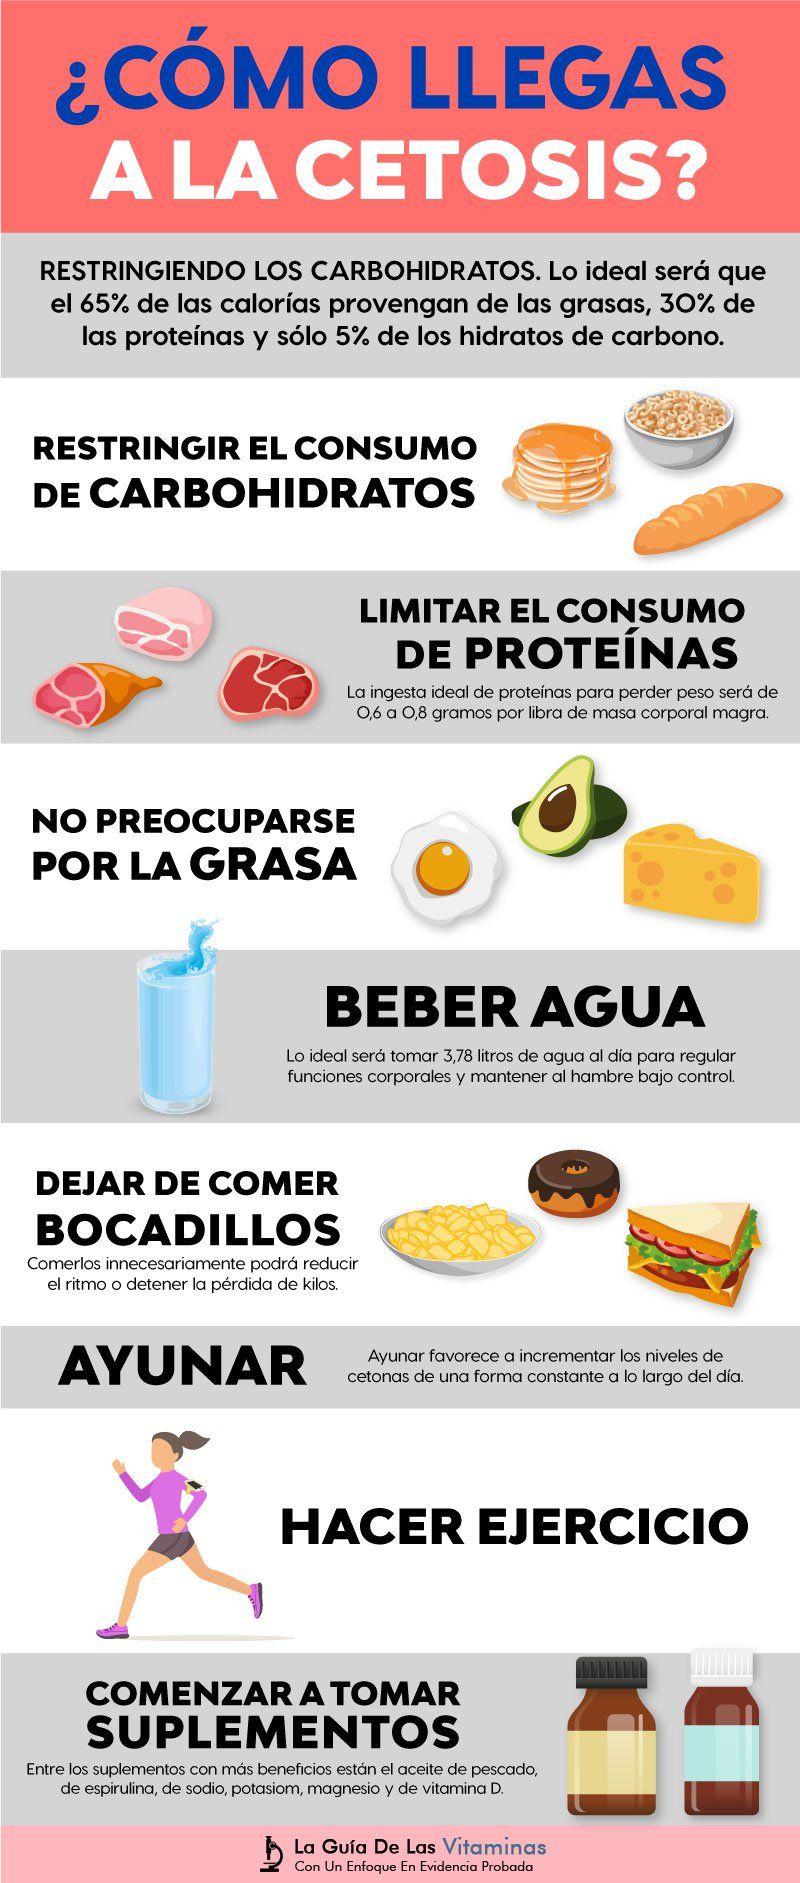 dieta cetosis cuánta proteína por comida